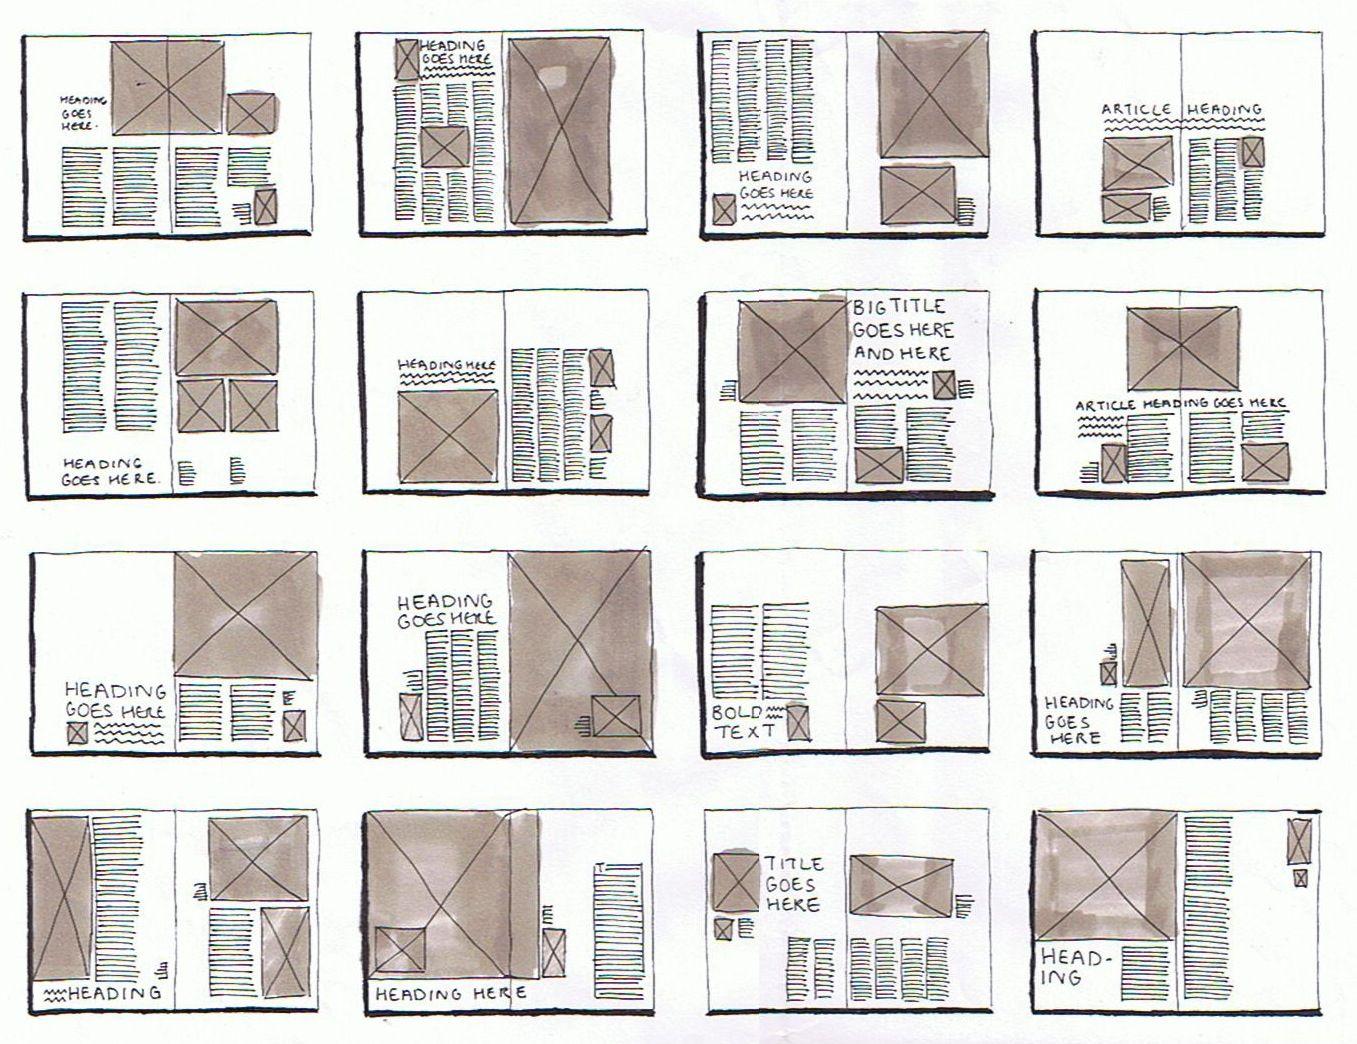 2fb8e40ff7b4823f46b036e8a7cd112c.jpg 1 357×1 044 pixels | typography ...